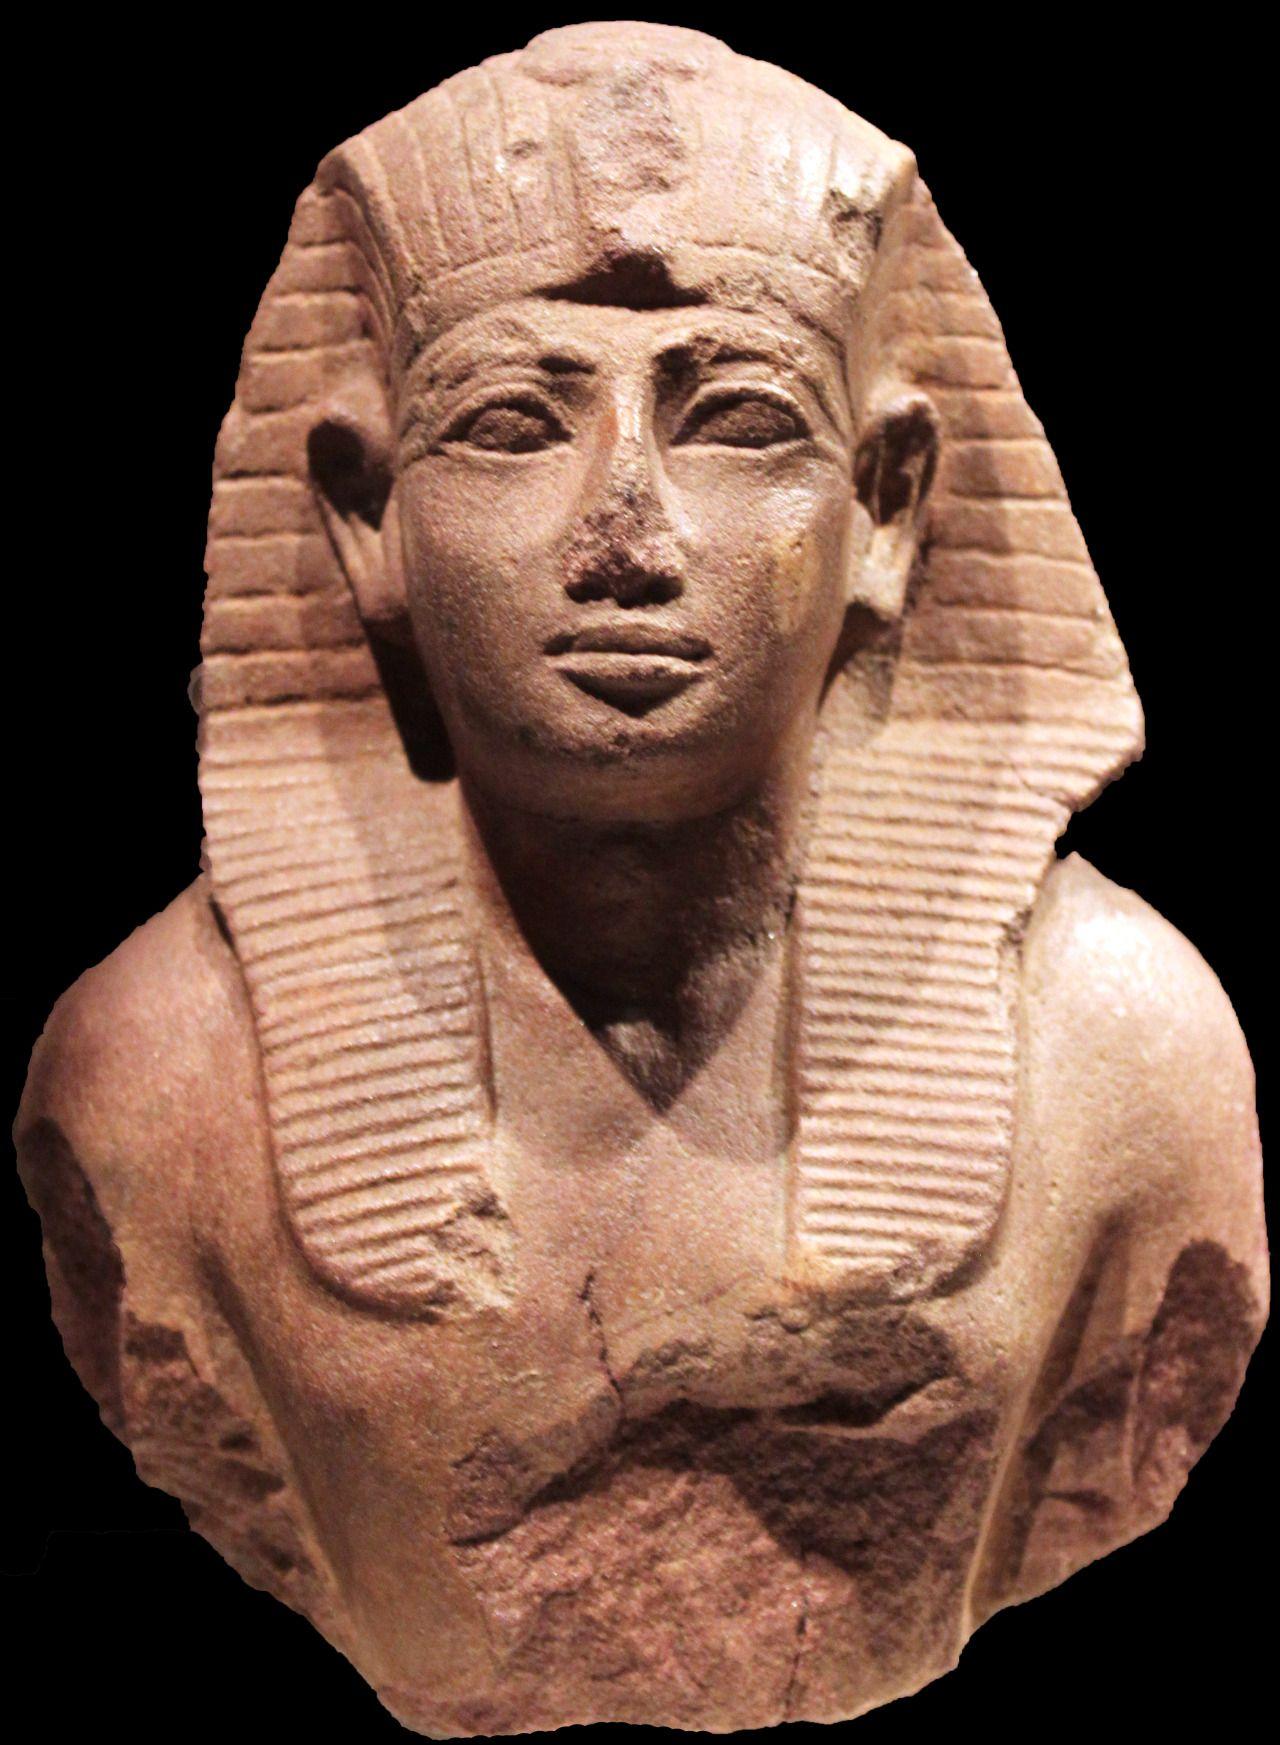 Upper part of a statue of Amenotep II. 18th dynasty, c. 1425 B.C.